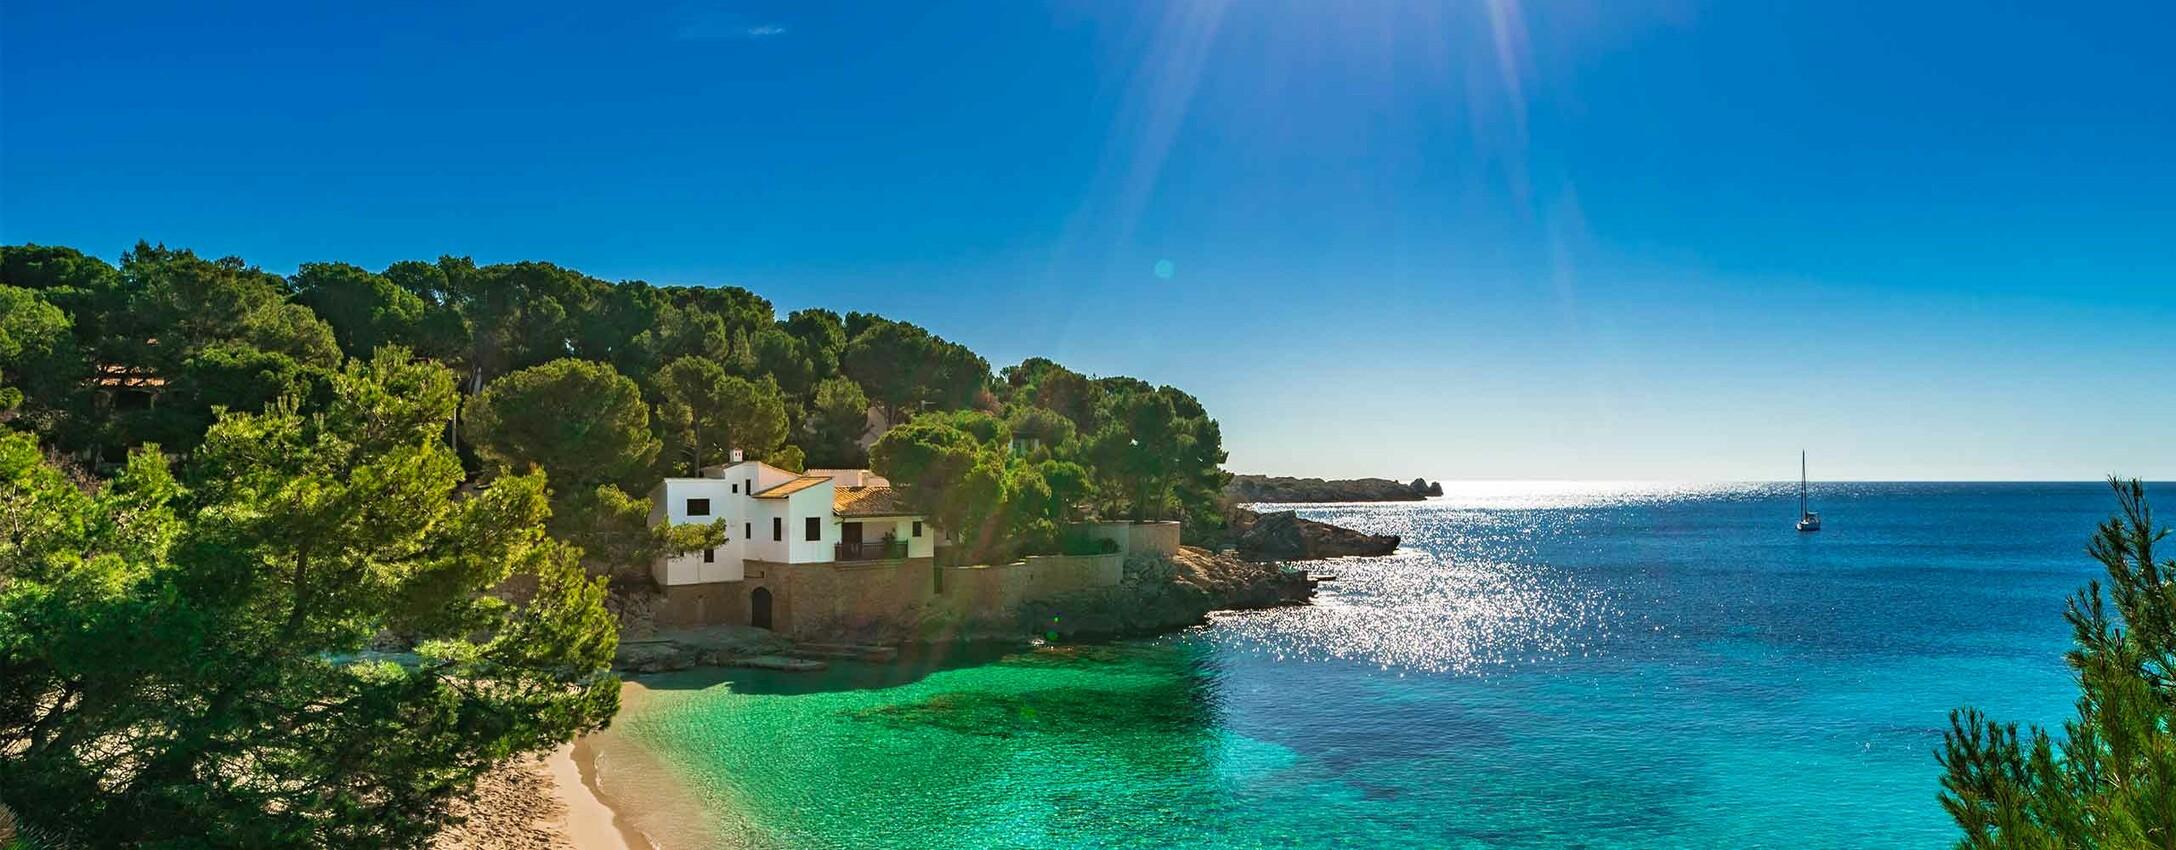 Mallorca Nur Flug Angebot 2020